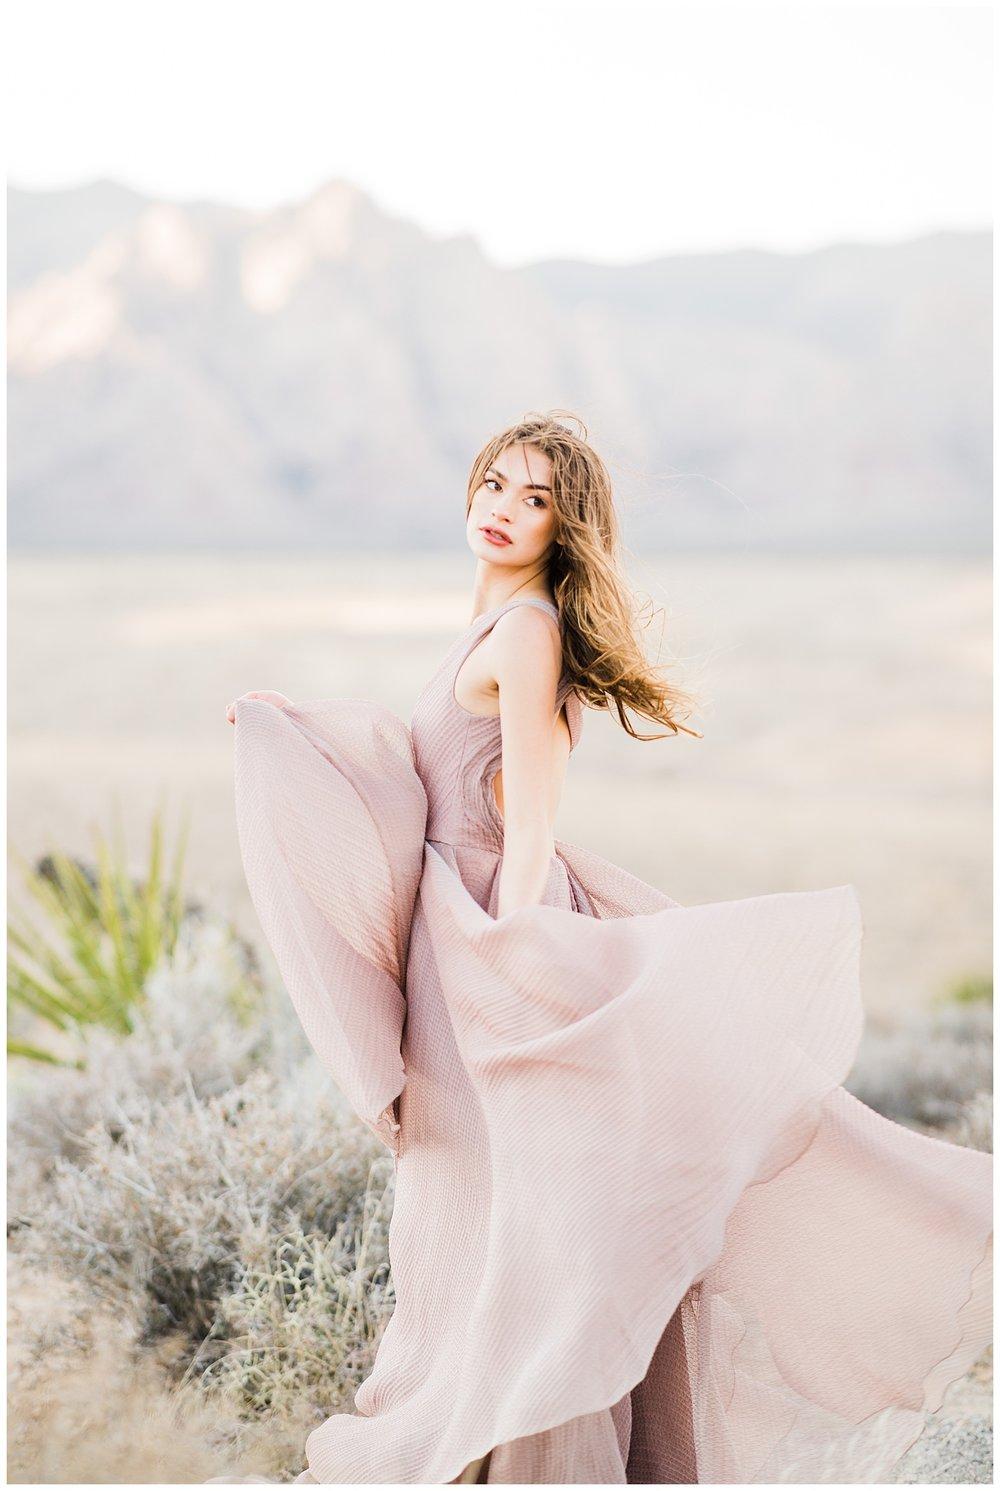 carol-hanna-bridal-gown-julie-paisley-desert-shootout.jpg